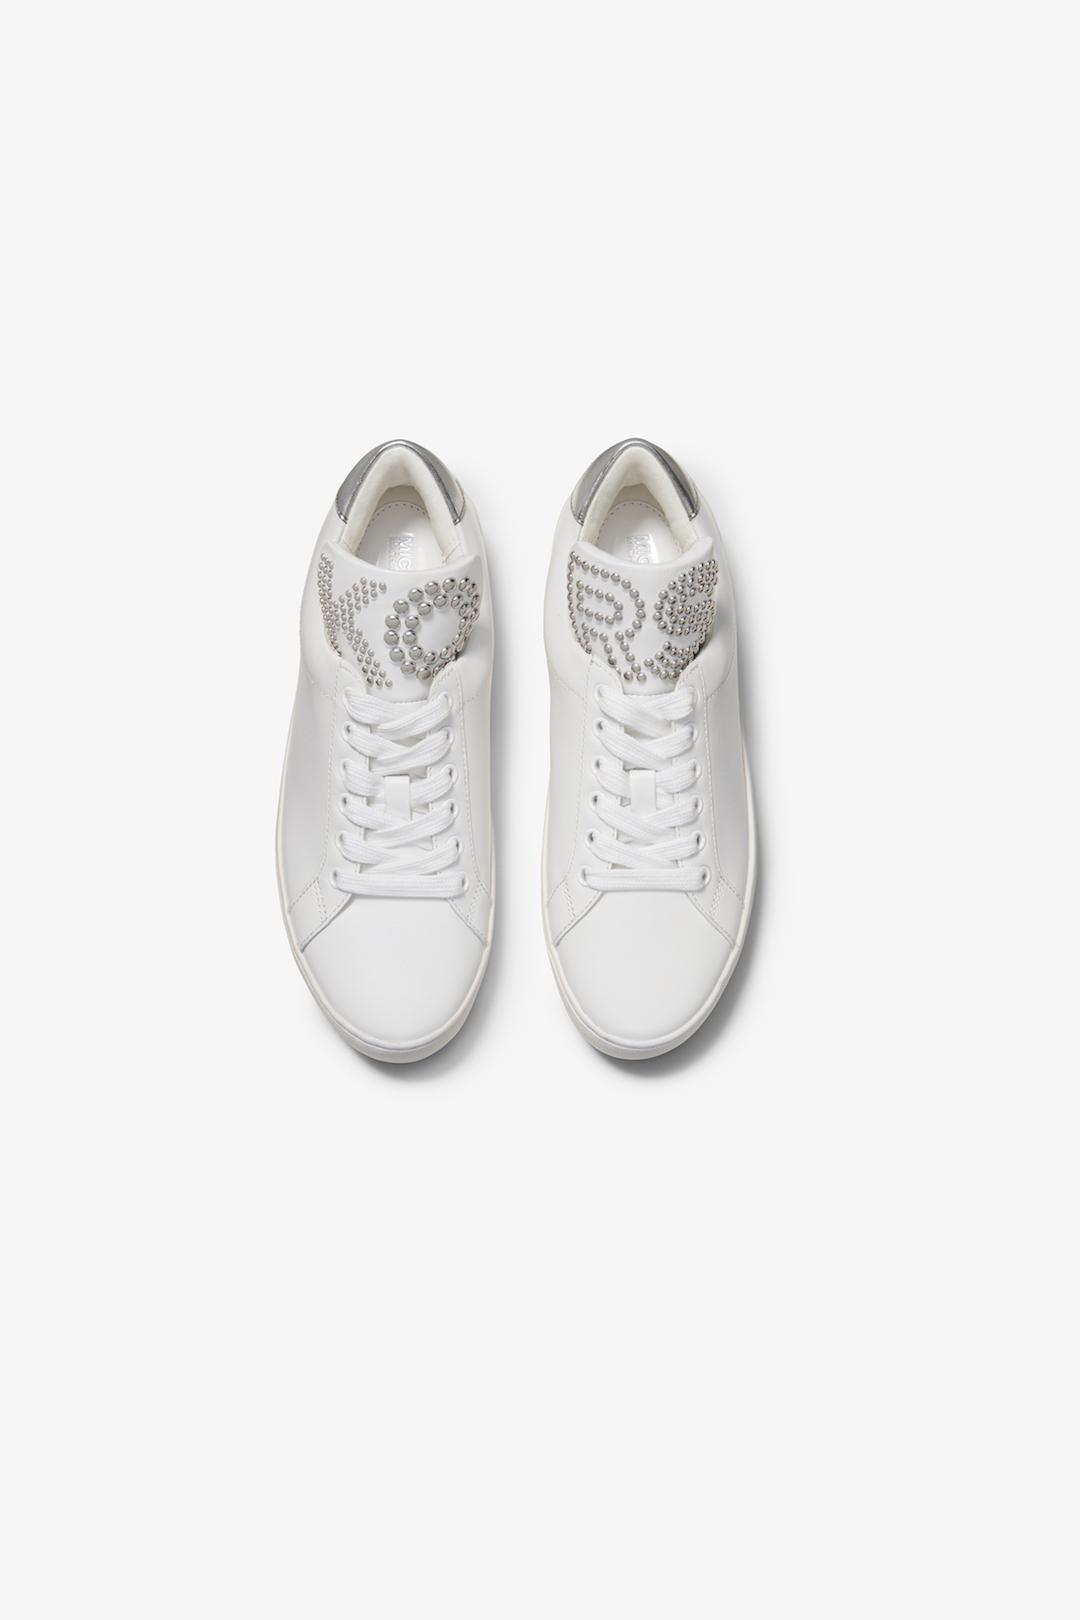 MICHAEL Michael Kors White Studded Leather Mindy Sneaker.jpg